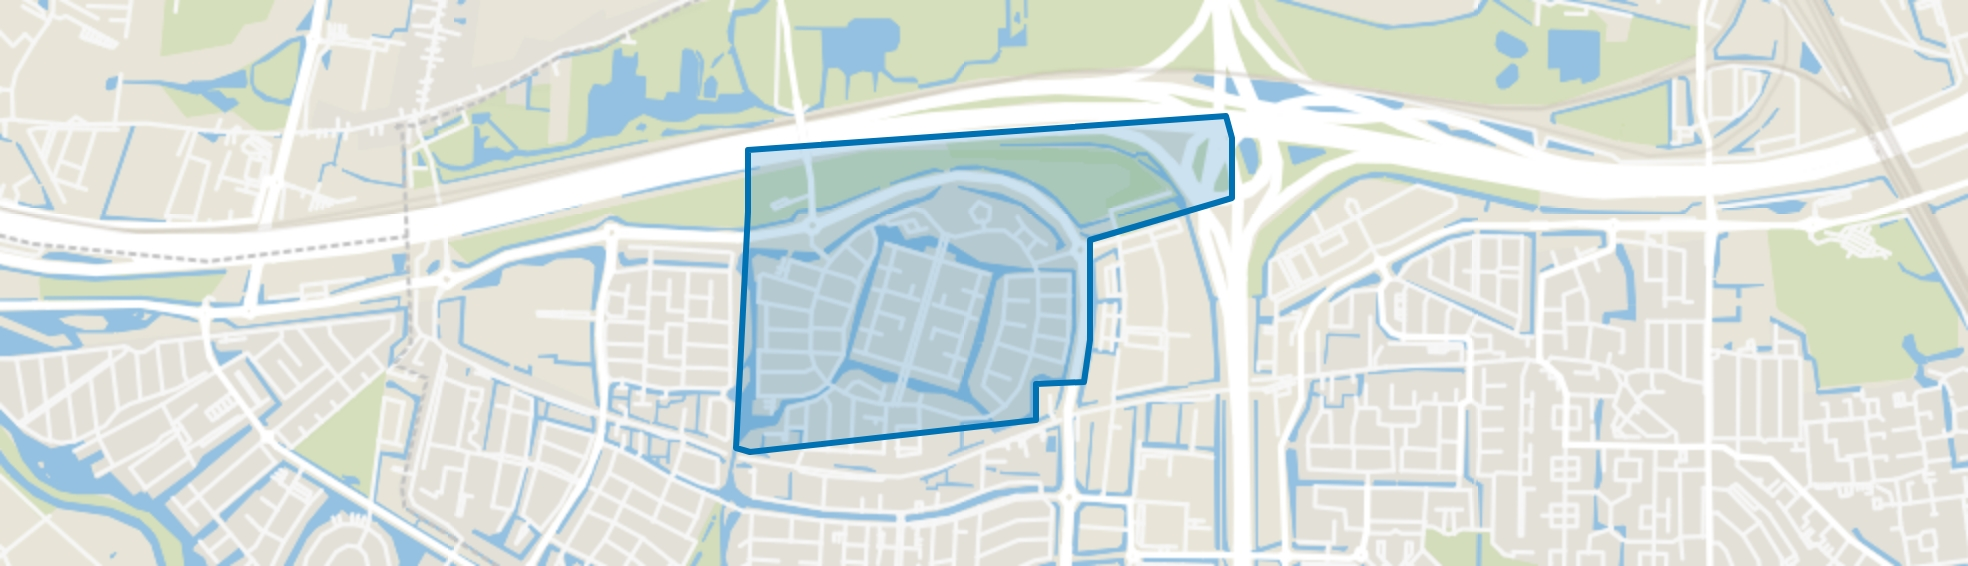 Vrijenburg, Barendrecht map